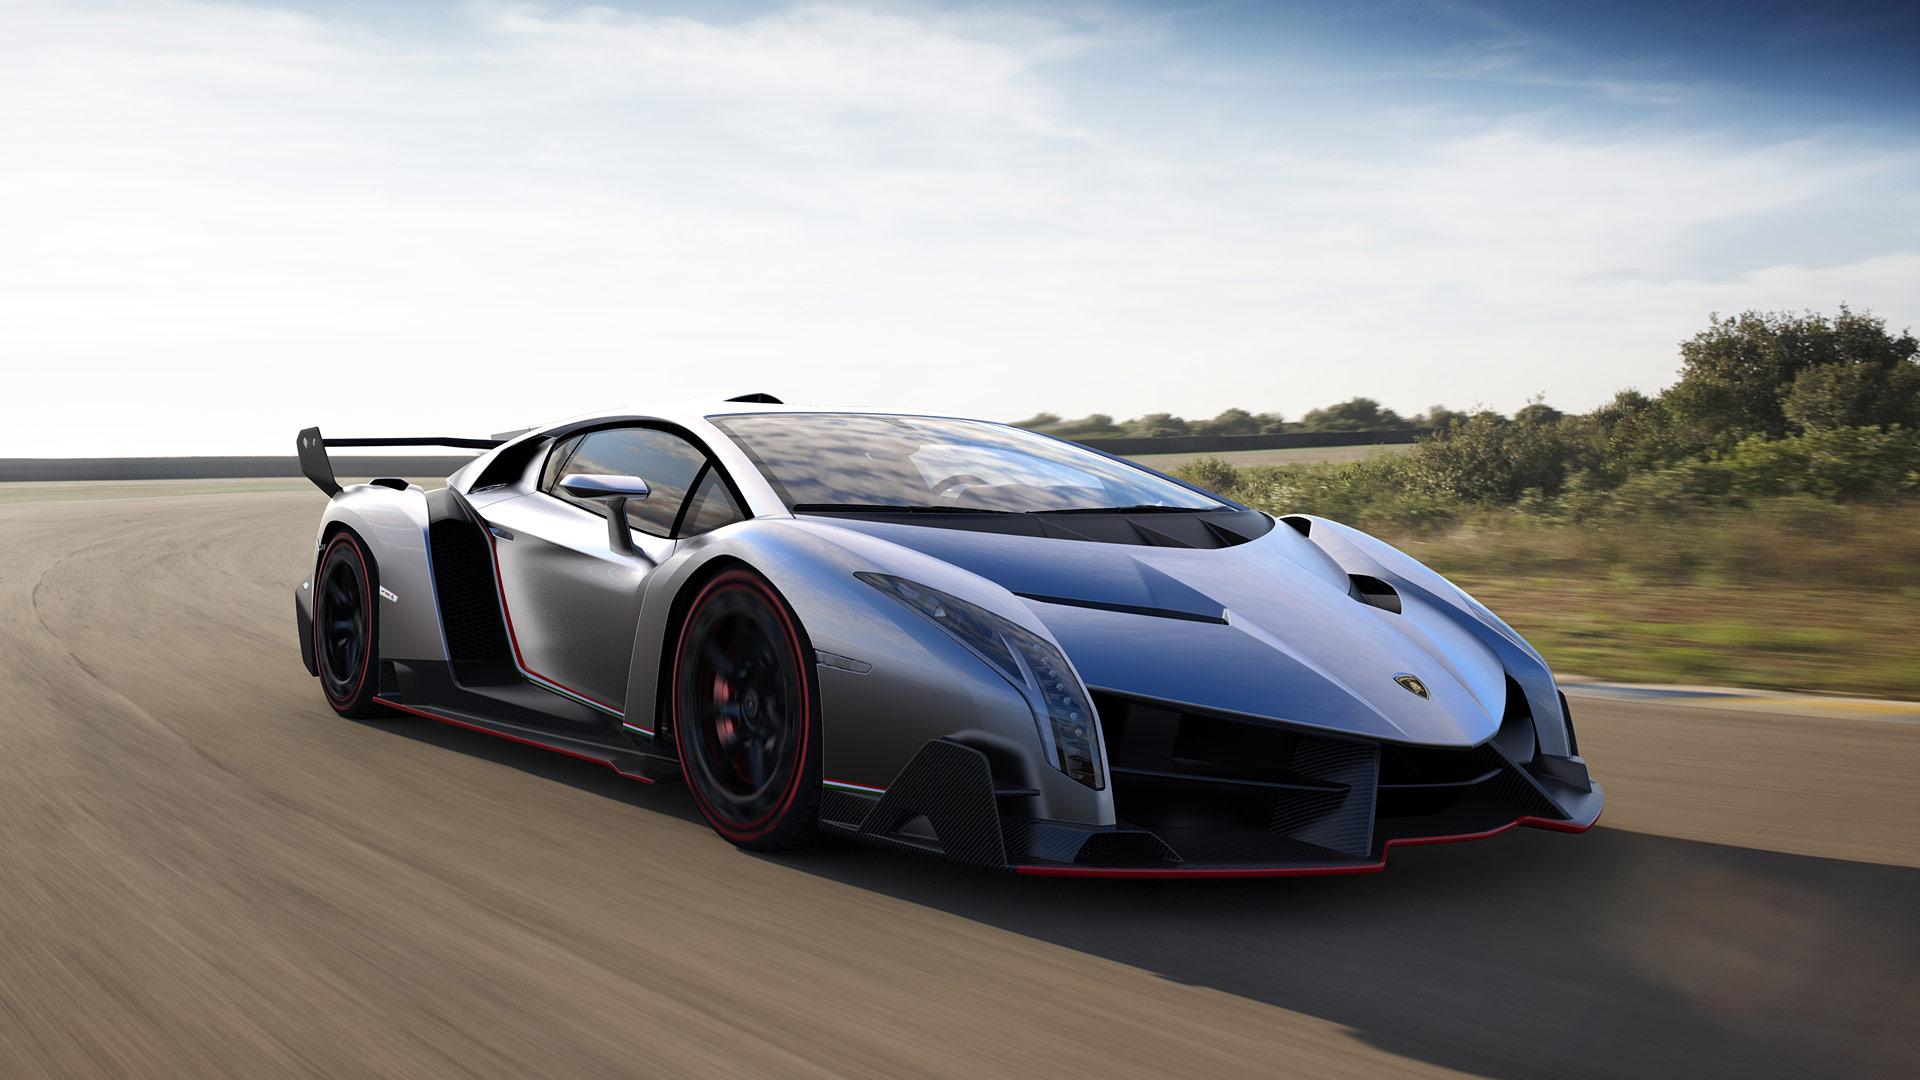 Lamborghini Veneno HD wallpaper 1080p HD Resolutions Car 1920x1080